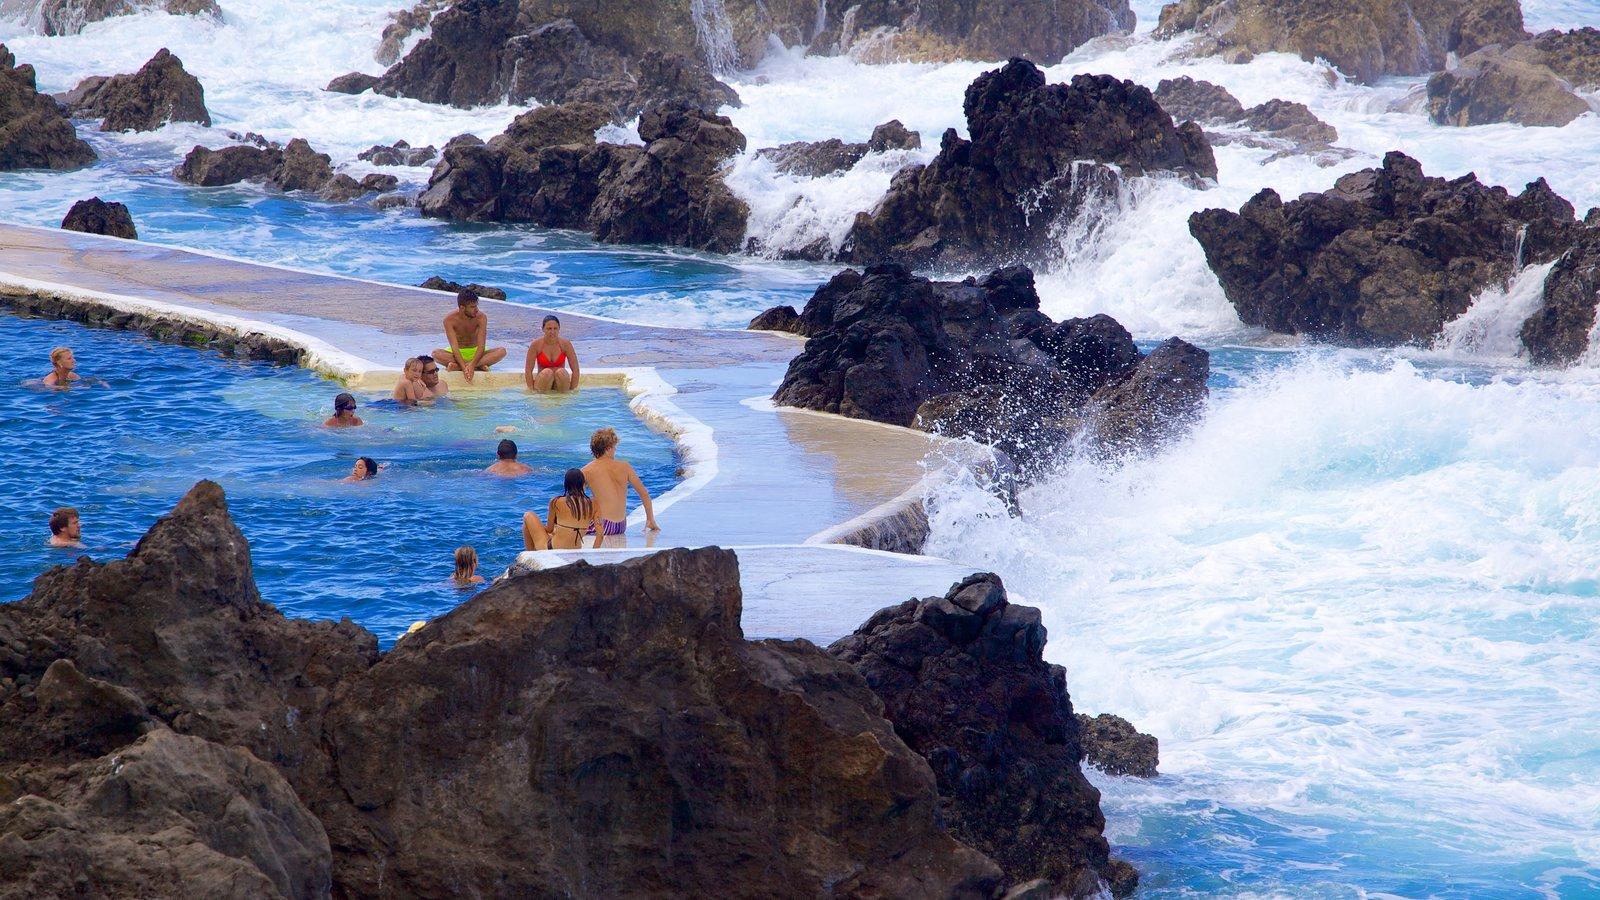 Fotos de piscinas naturales de porto moniz ver fotos e for Piscinas naturales cerca de valladolid